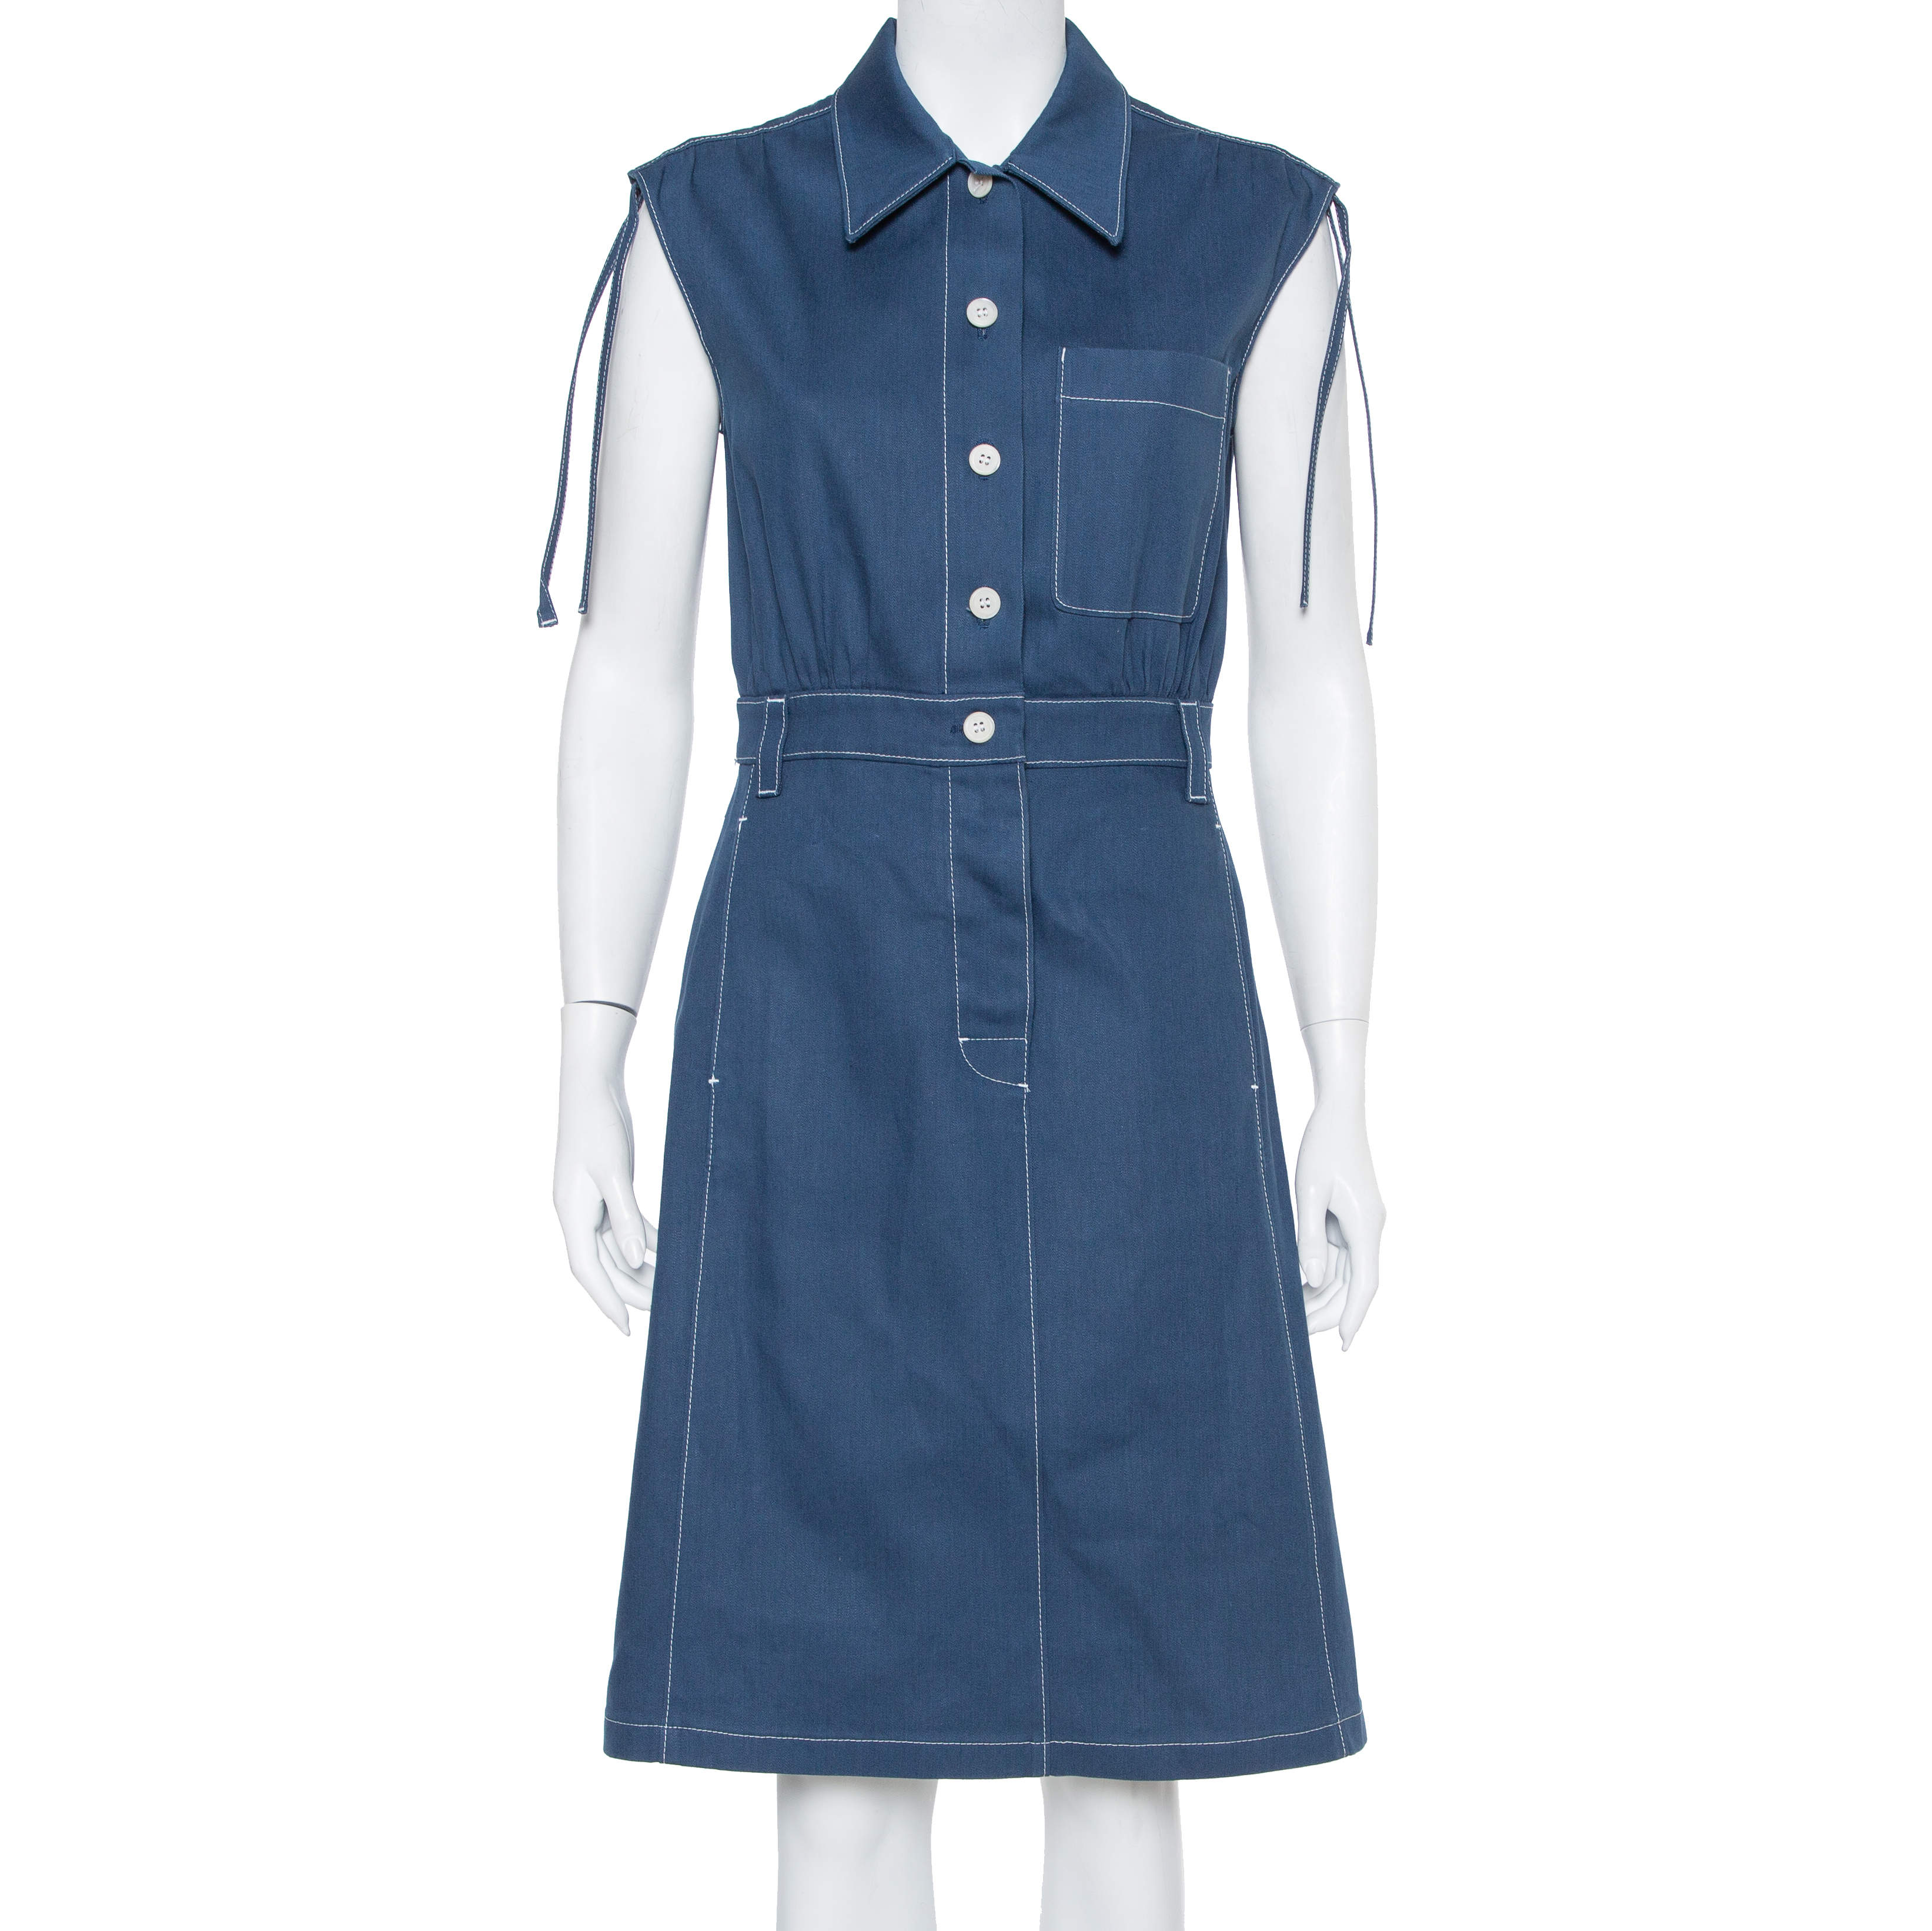 Prada Navy Blue Denim Button Front Sleeveless Midi Dress M